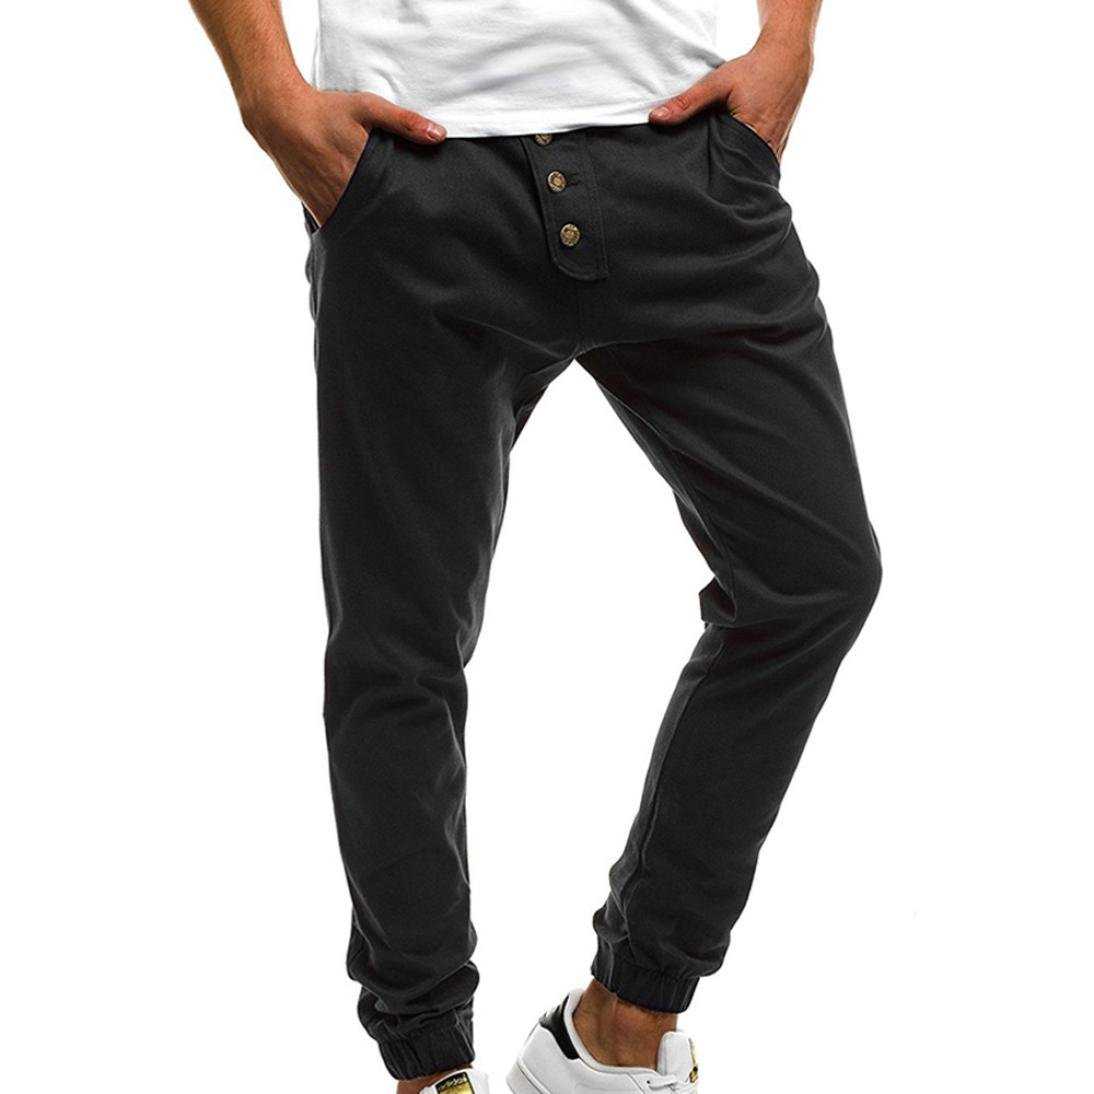 PASATO Fashion Men's Sport Pure Color Button Casual Loose Sweatpants Drawstring Pant(Black, XL)